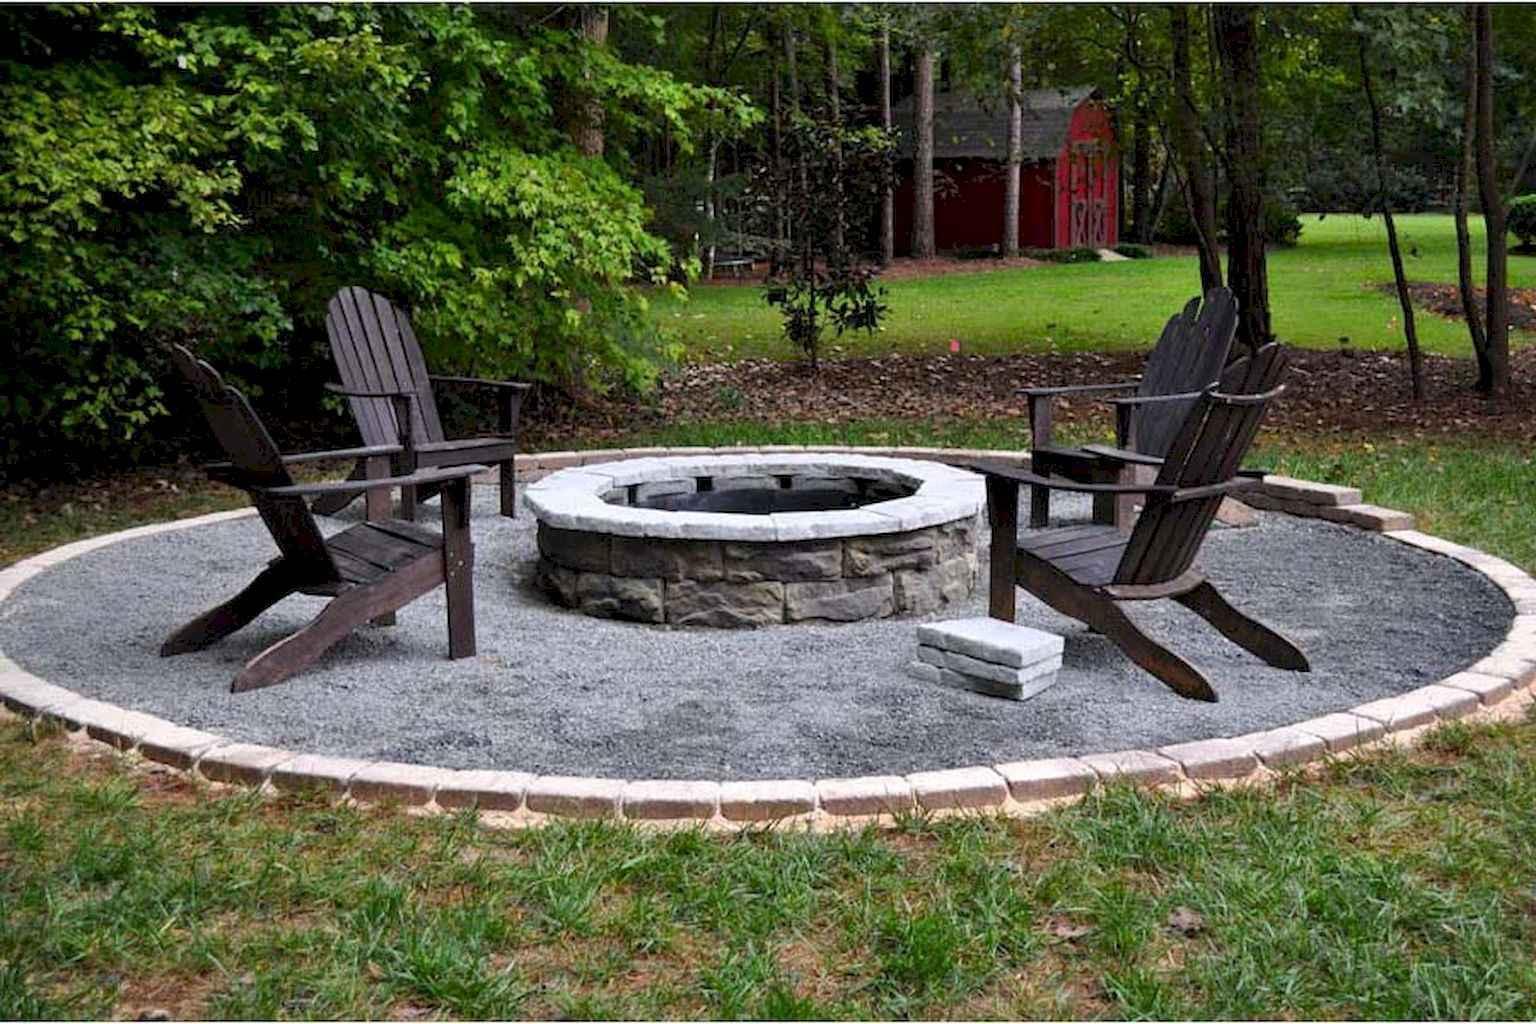 60 Beautiful Backyard Fire Pit Ideas Decoration and Remodel (30)